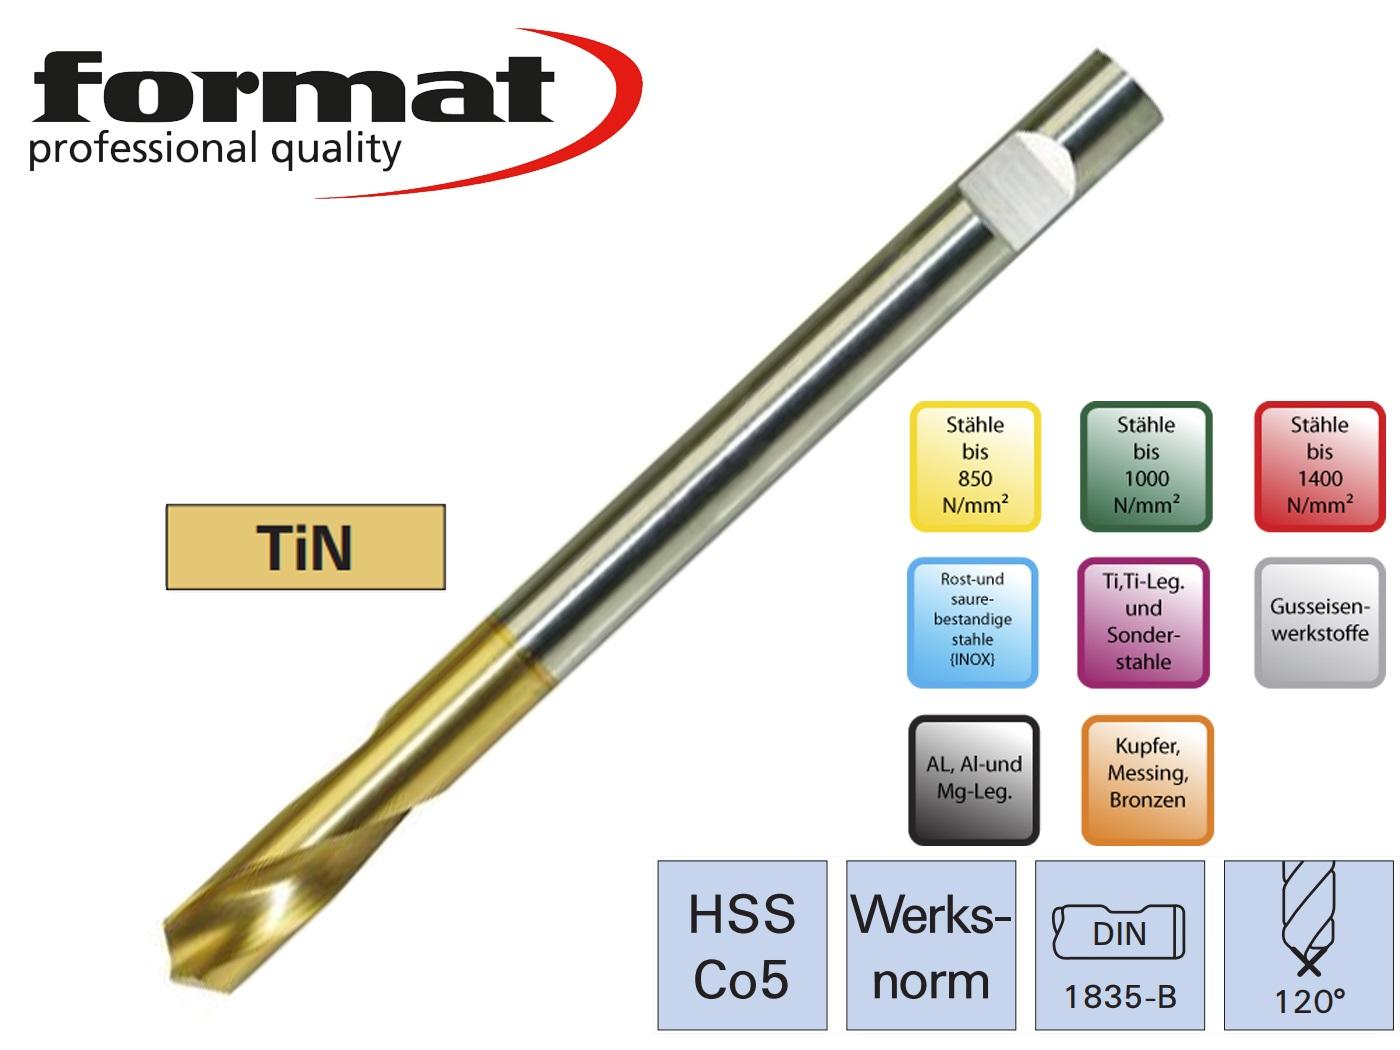 Centerboor NC DIN 1835 B HSSCo5 120G lang FORMAT | DKMTools - DKM Tools